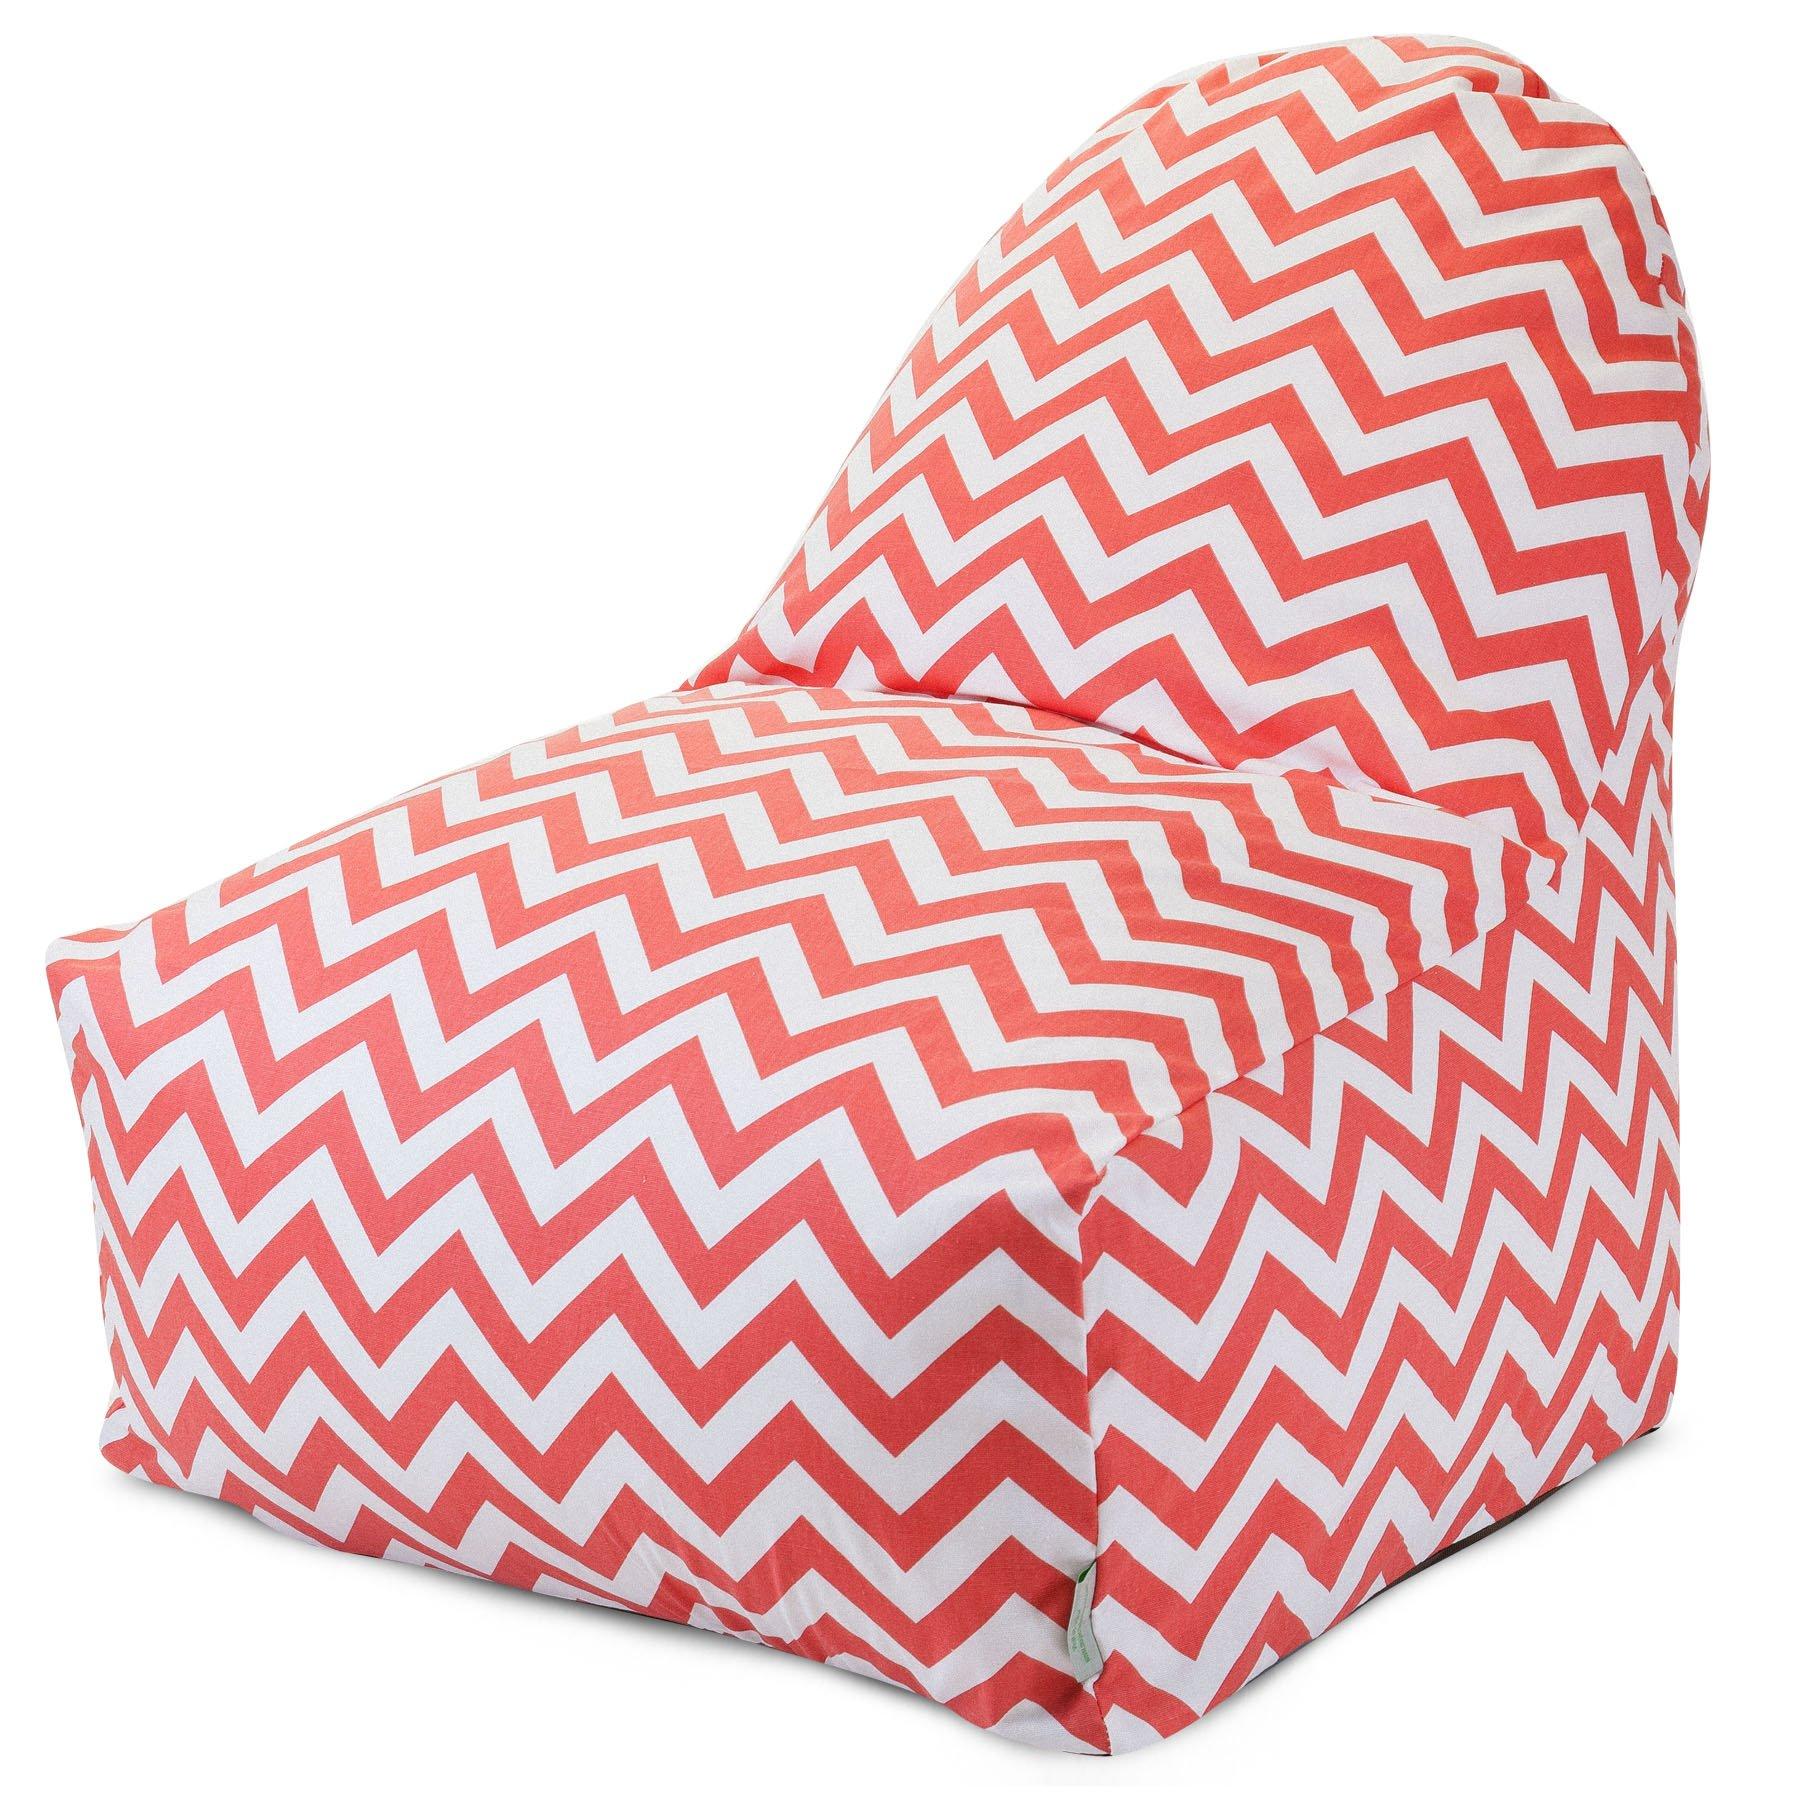 Majestic Home Goods Coral Chevron Kick-It Chair